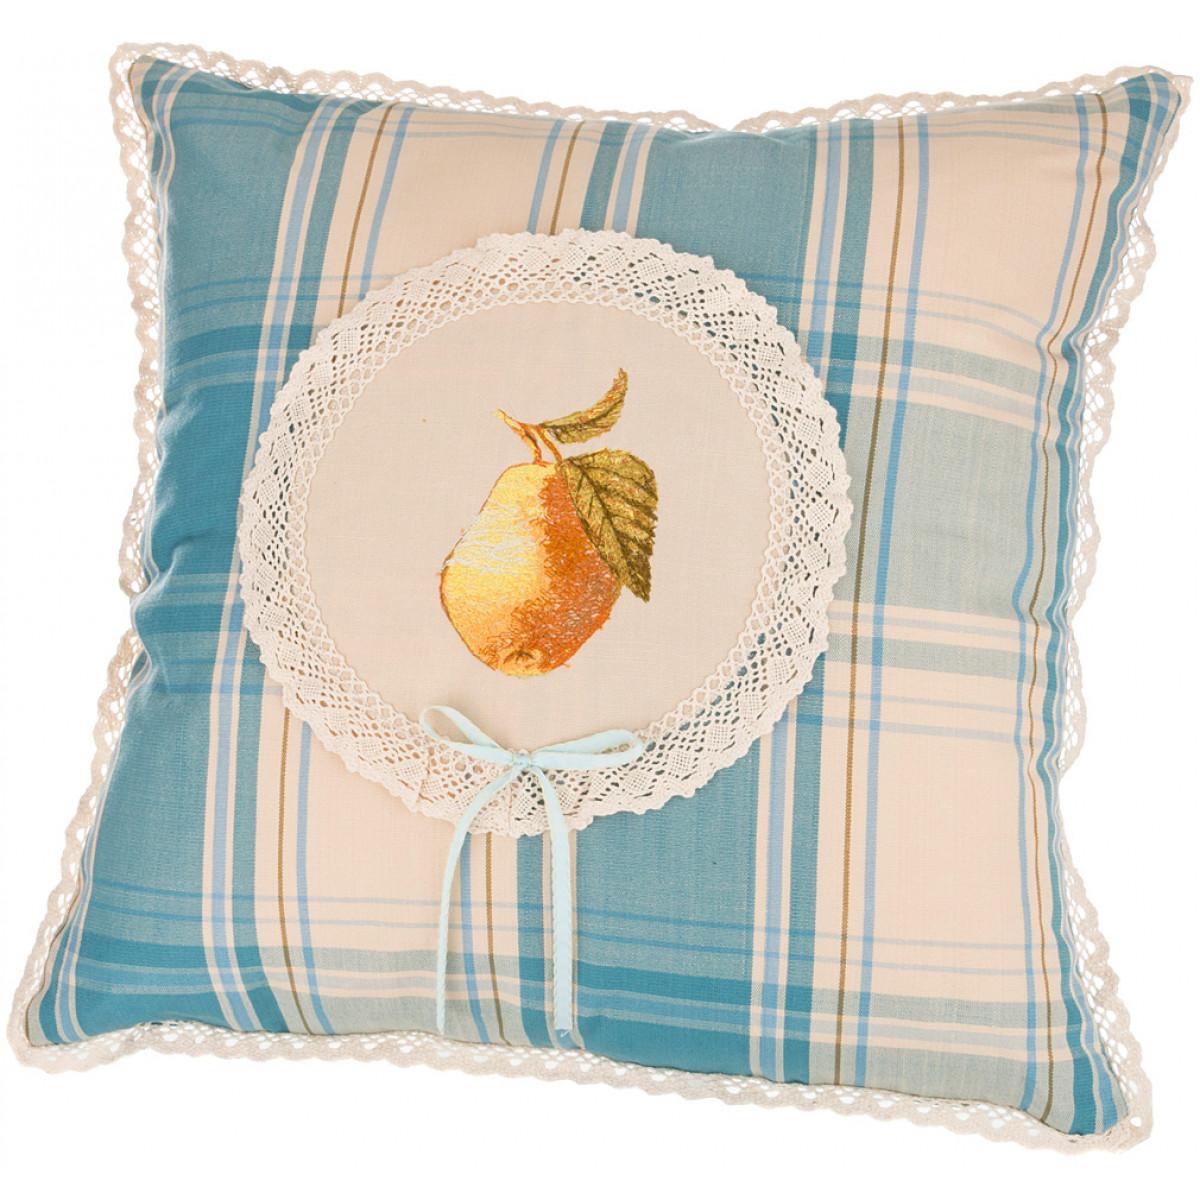 Декоративные подушки Santalino Декоративная подушка Фрутта (47х47) подушка декоративная santalino райский сад 850 818 6